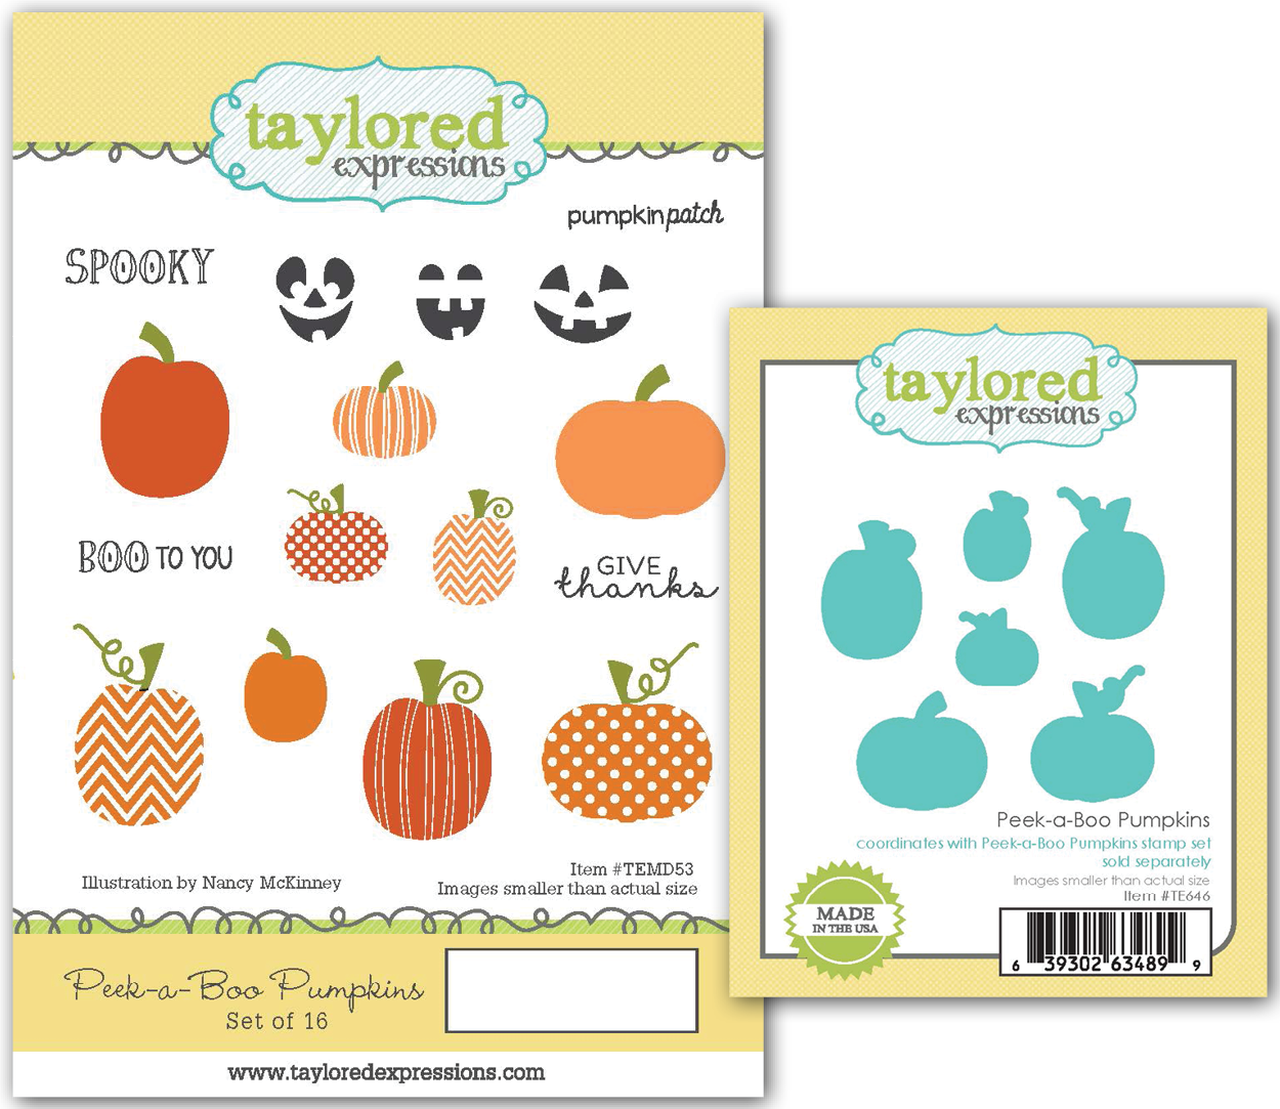 Taylored Expressions - Peek-a-Boo Pumpkins Stamp & Die Set